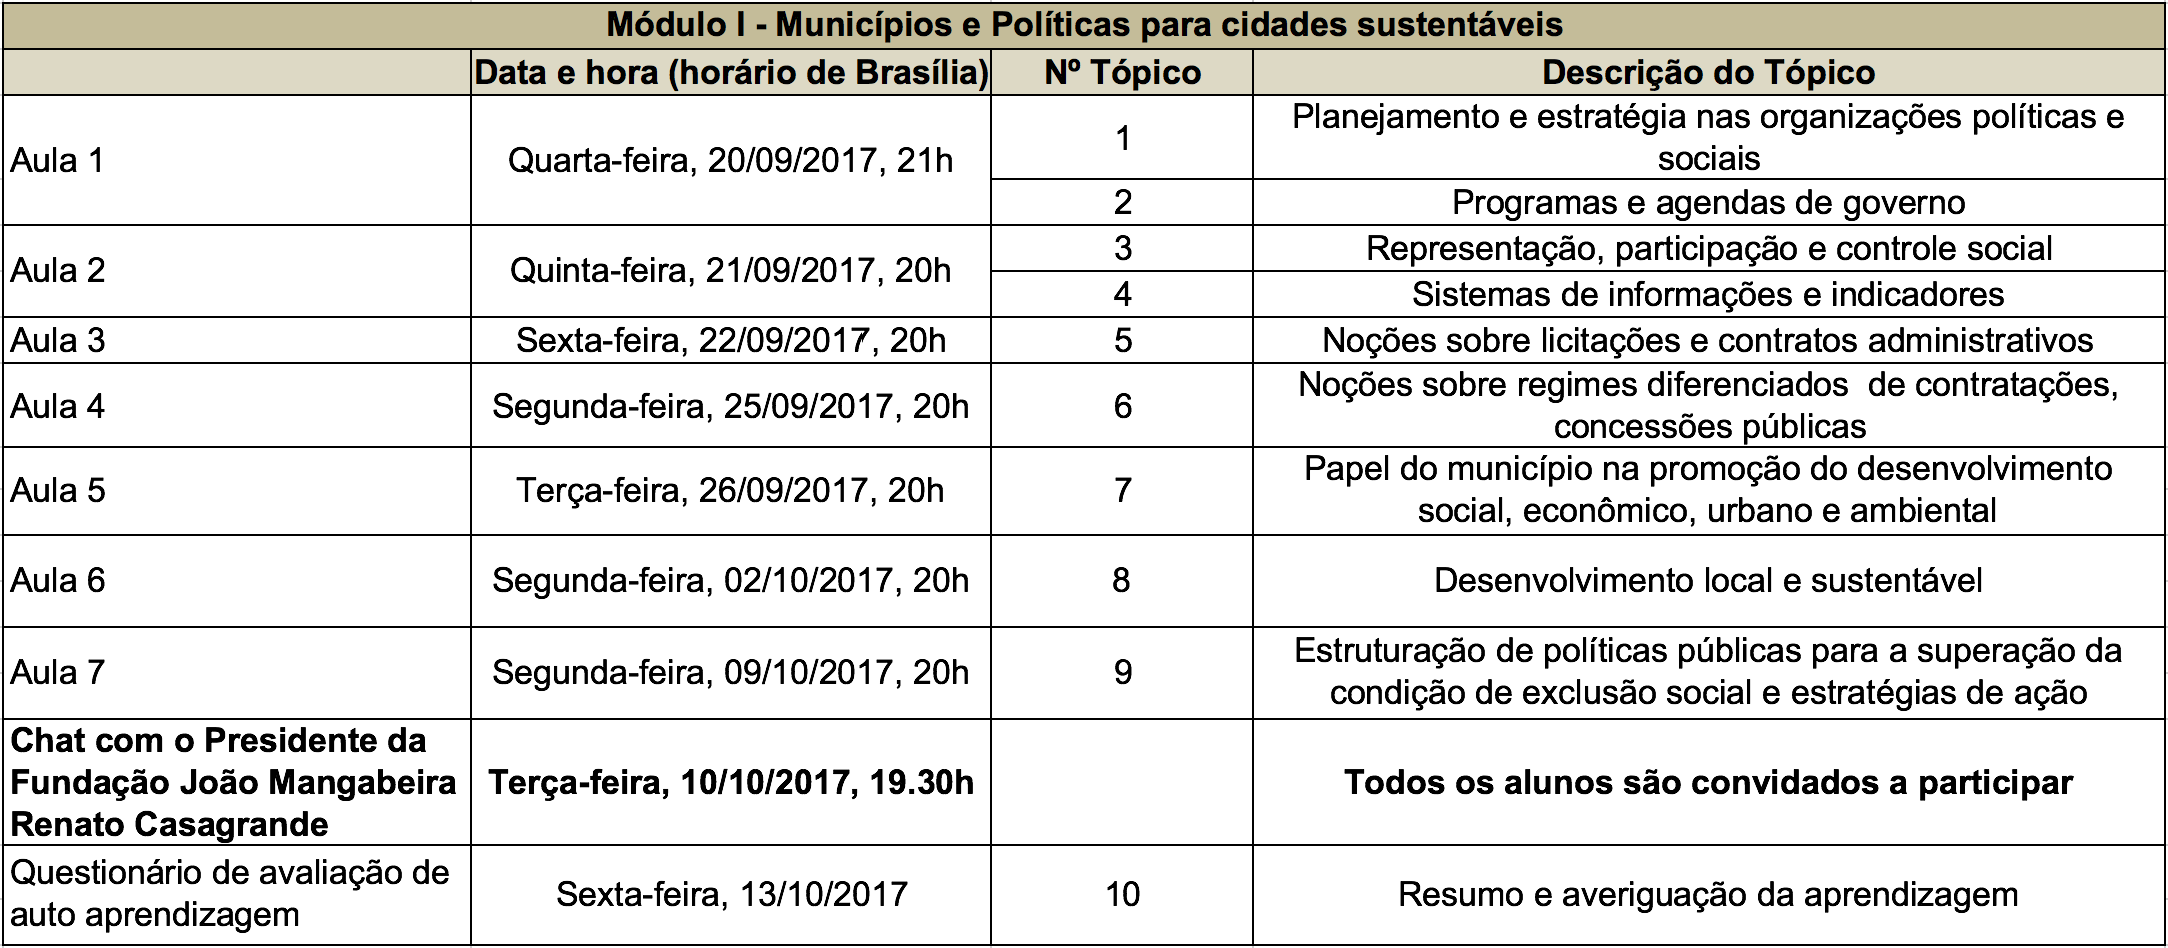 cronograma módulo 1